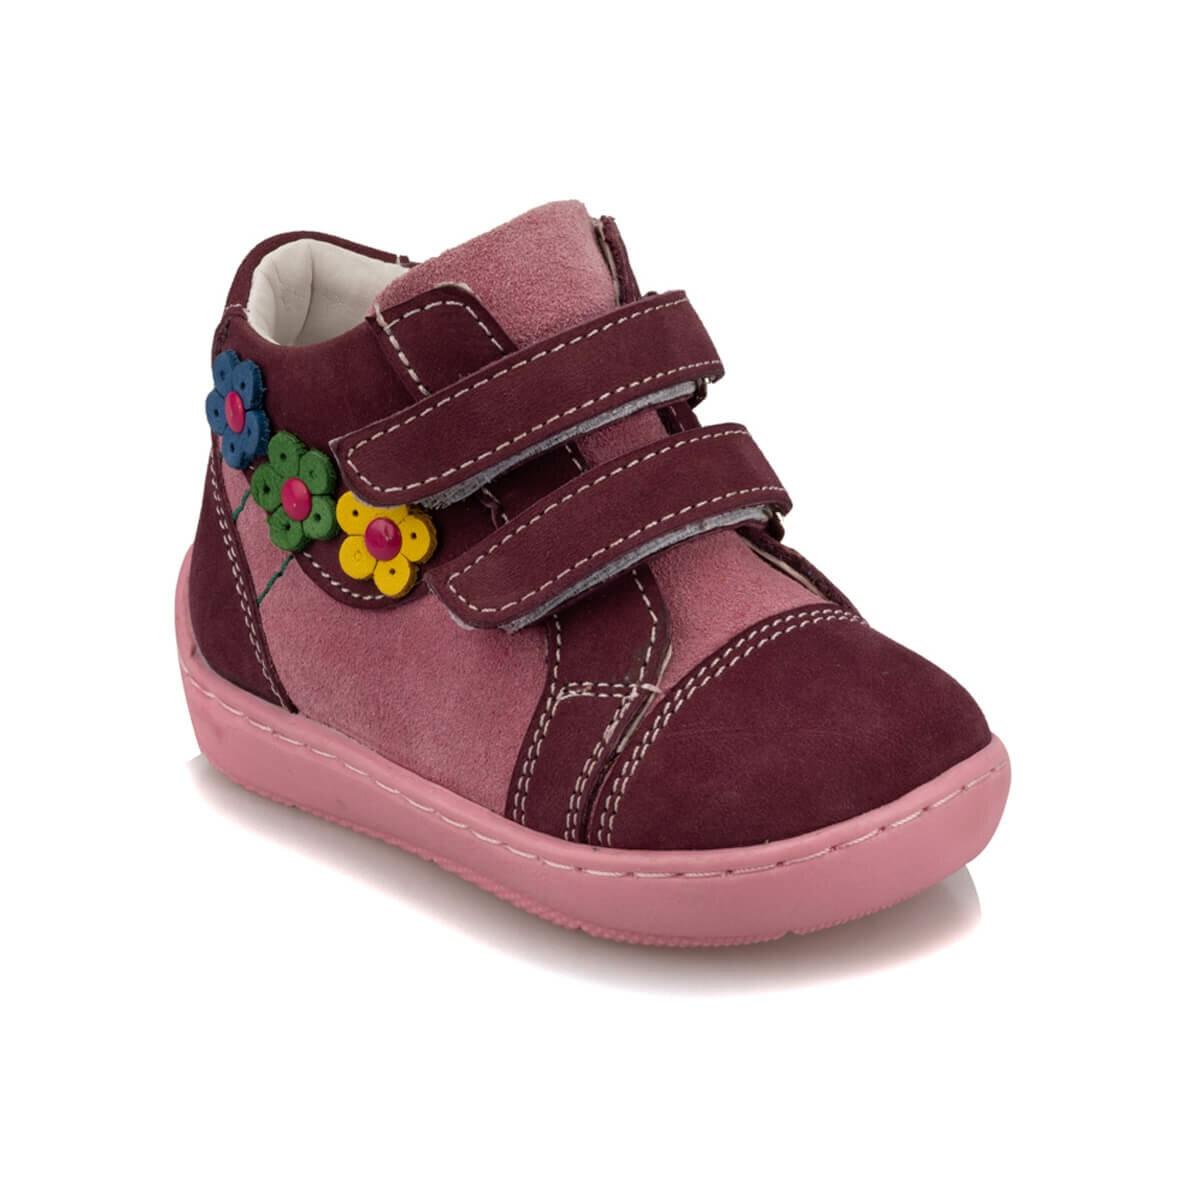 FLO 92.512019.I Purple Female Child Boots Polaris